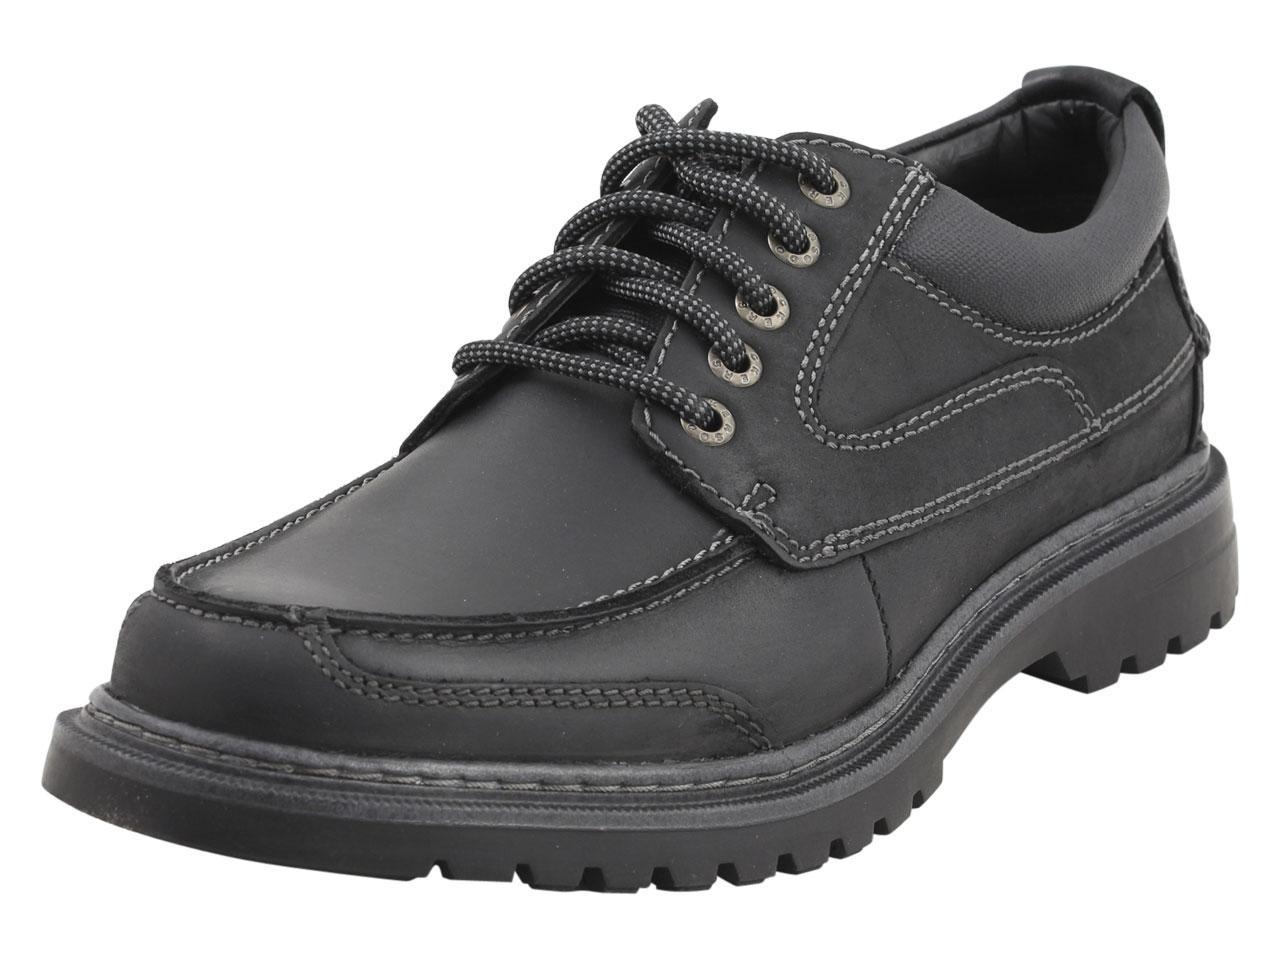 Image of Dockers Men's Overton Water Repellent Oxfords Shoes - Black - 8.5 D(M) US